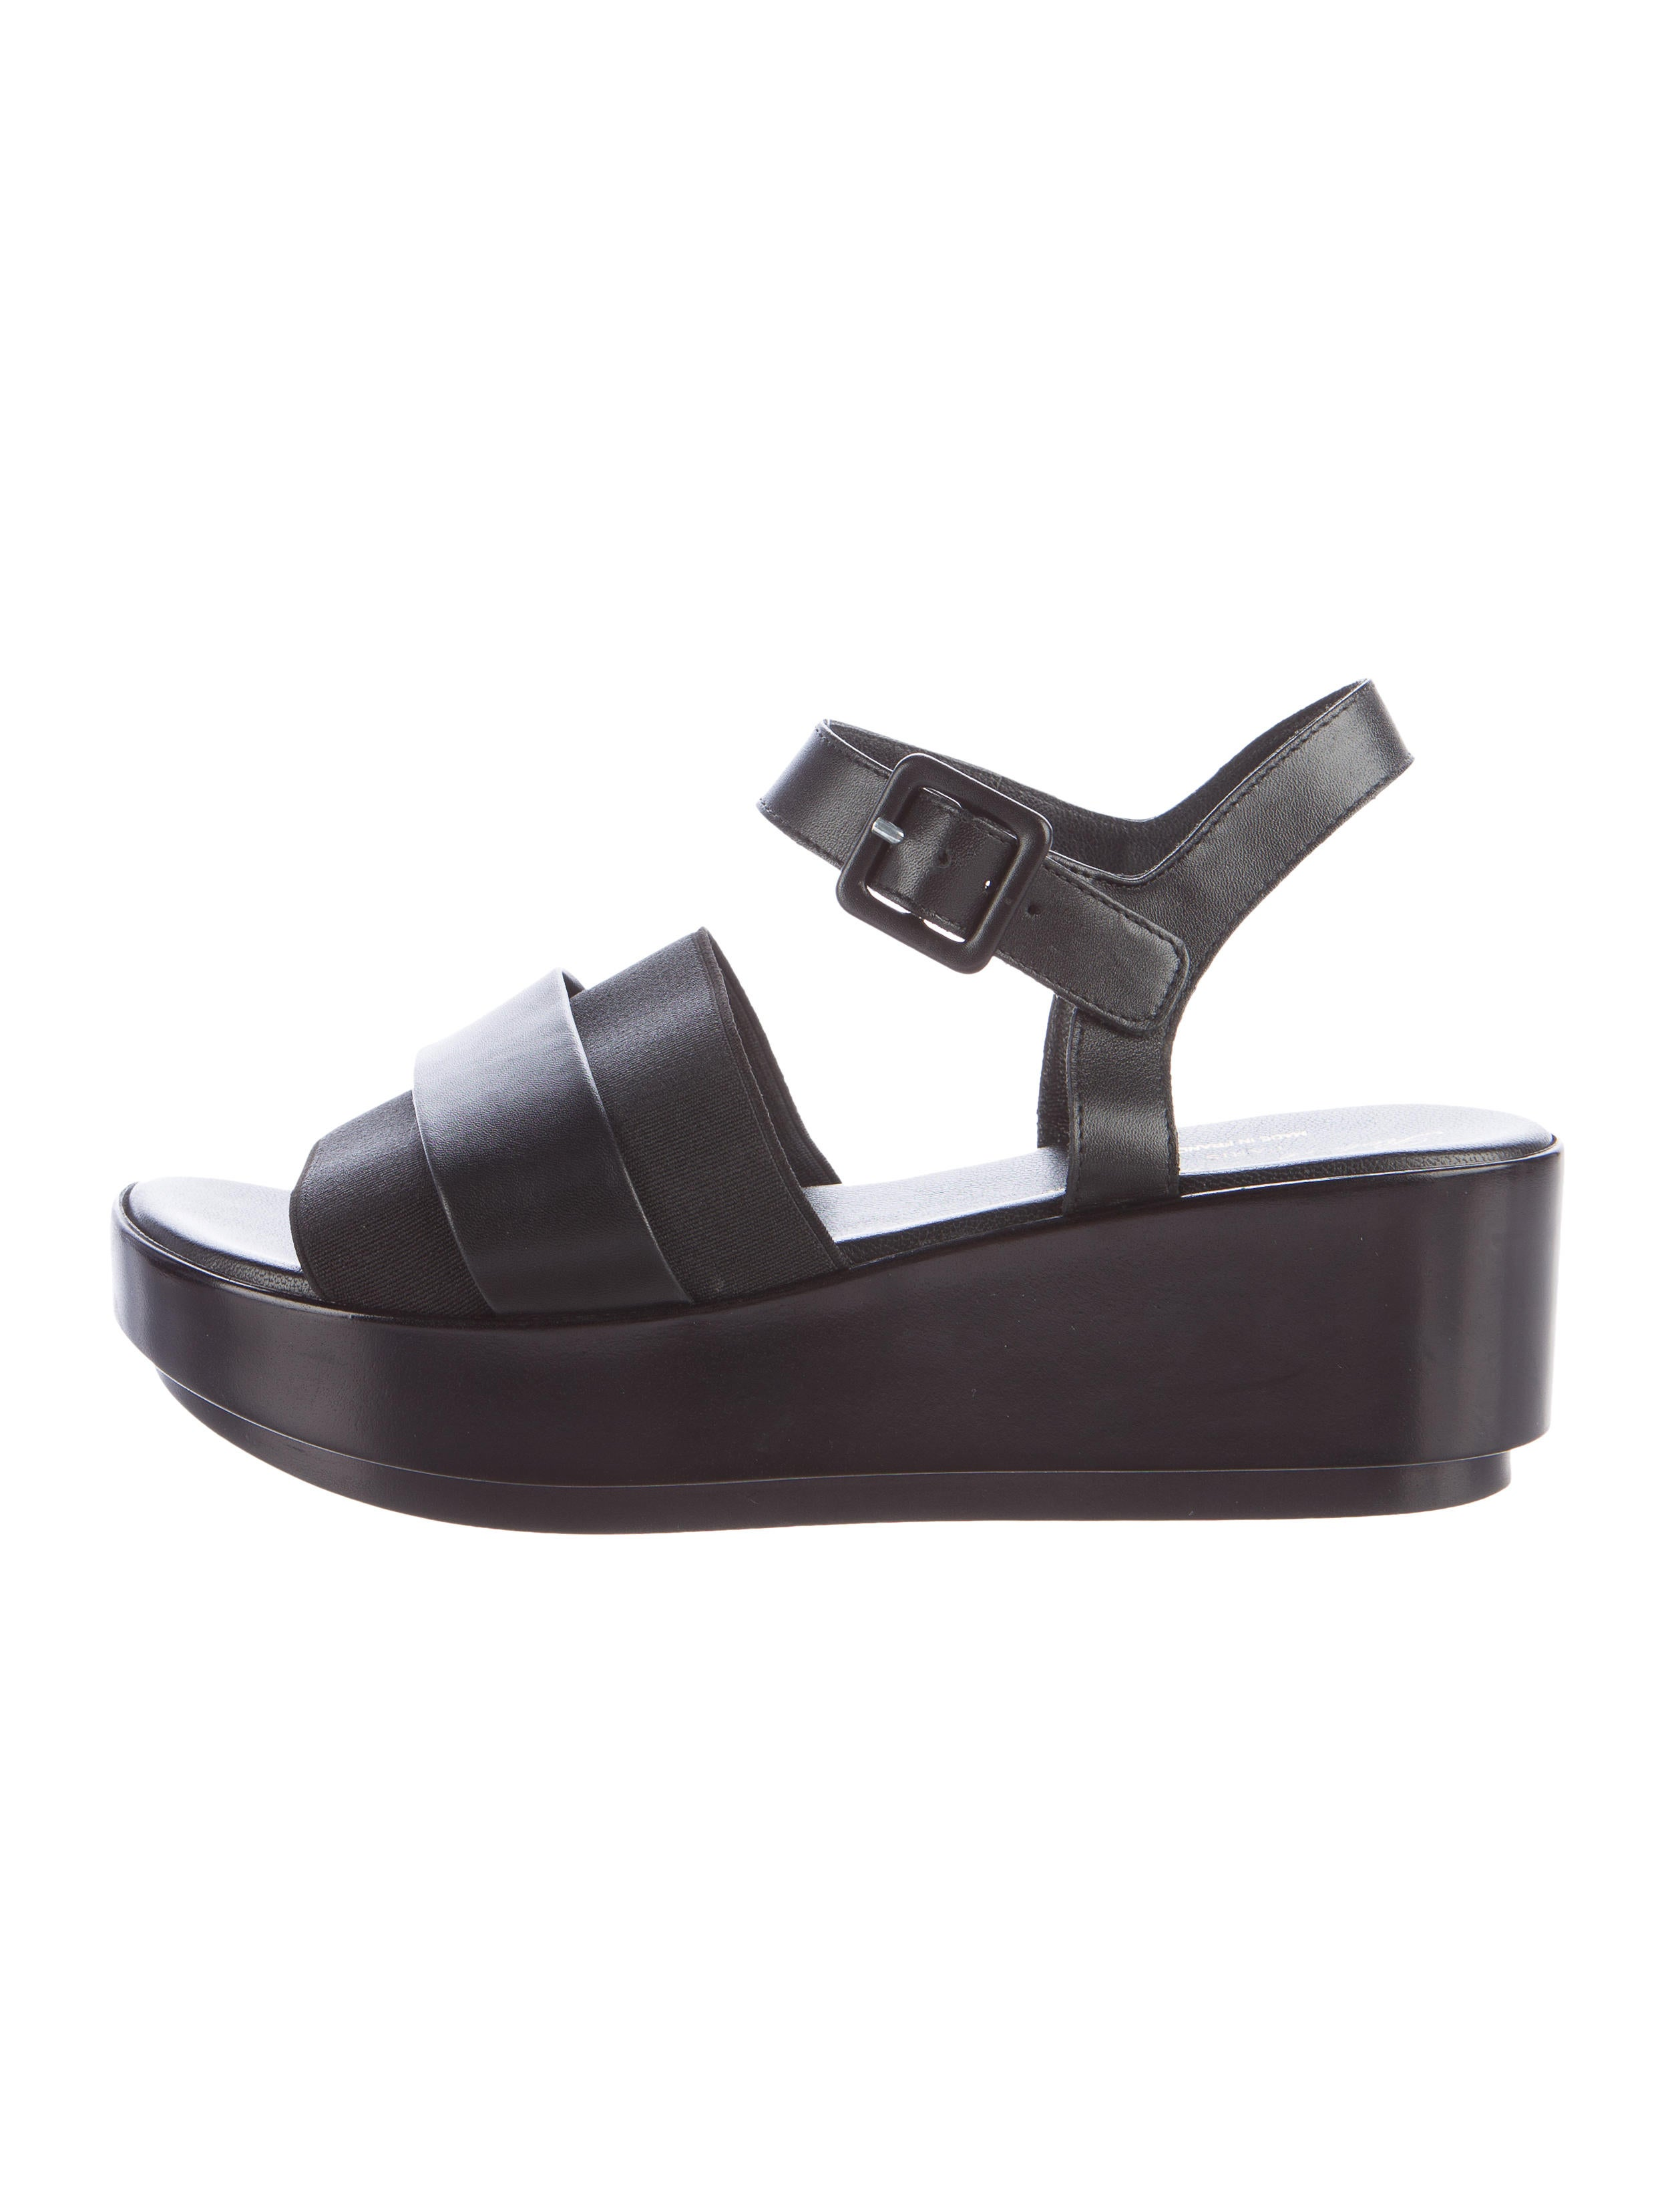 robert clergerie rubber platform sandals shoes